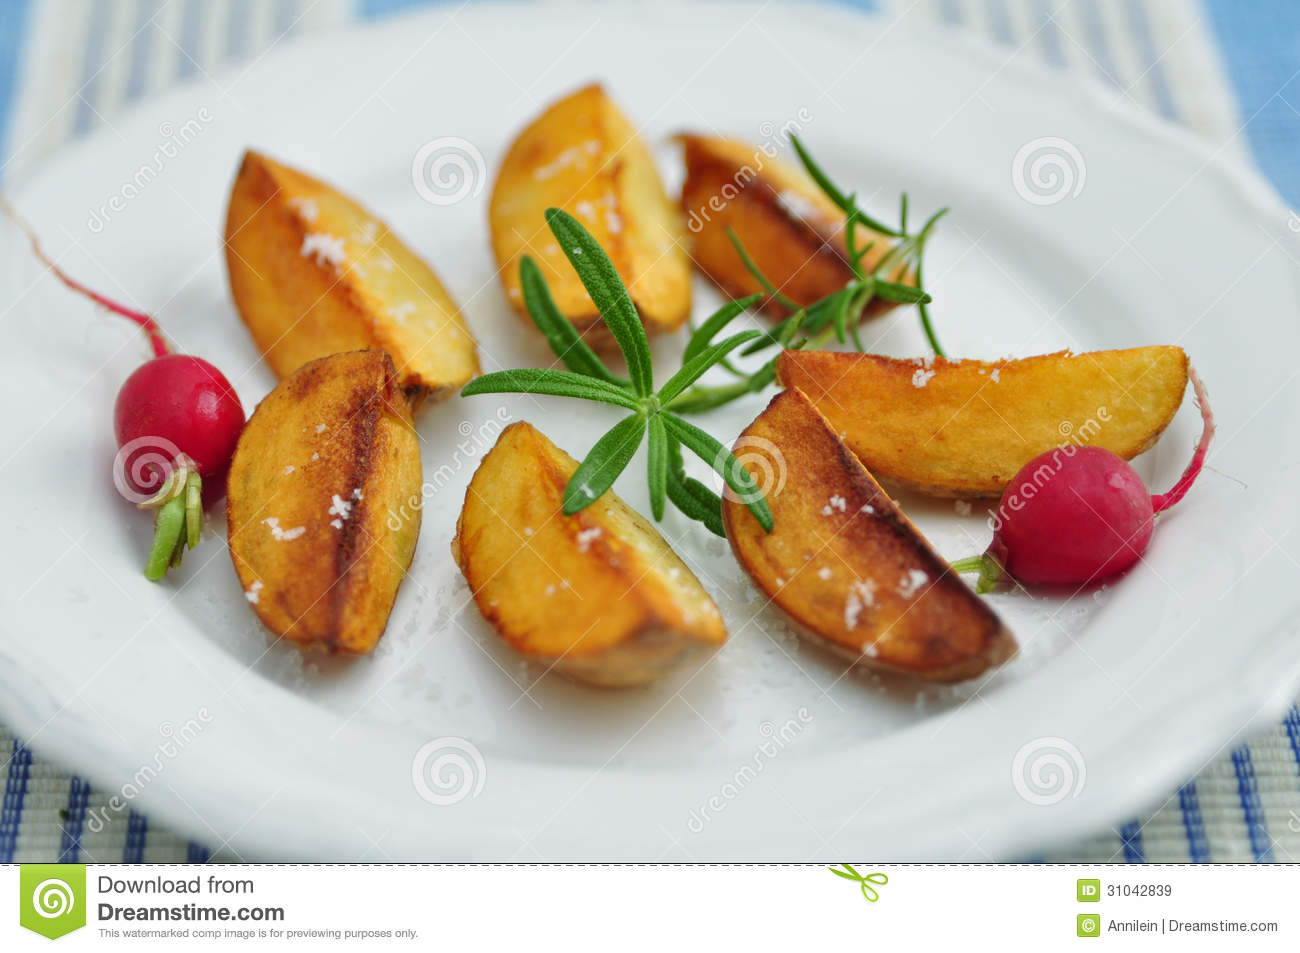 Bratkartoffeln, German Roast Potatoes Royalty Free Stock Images.